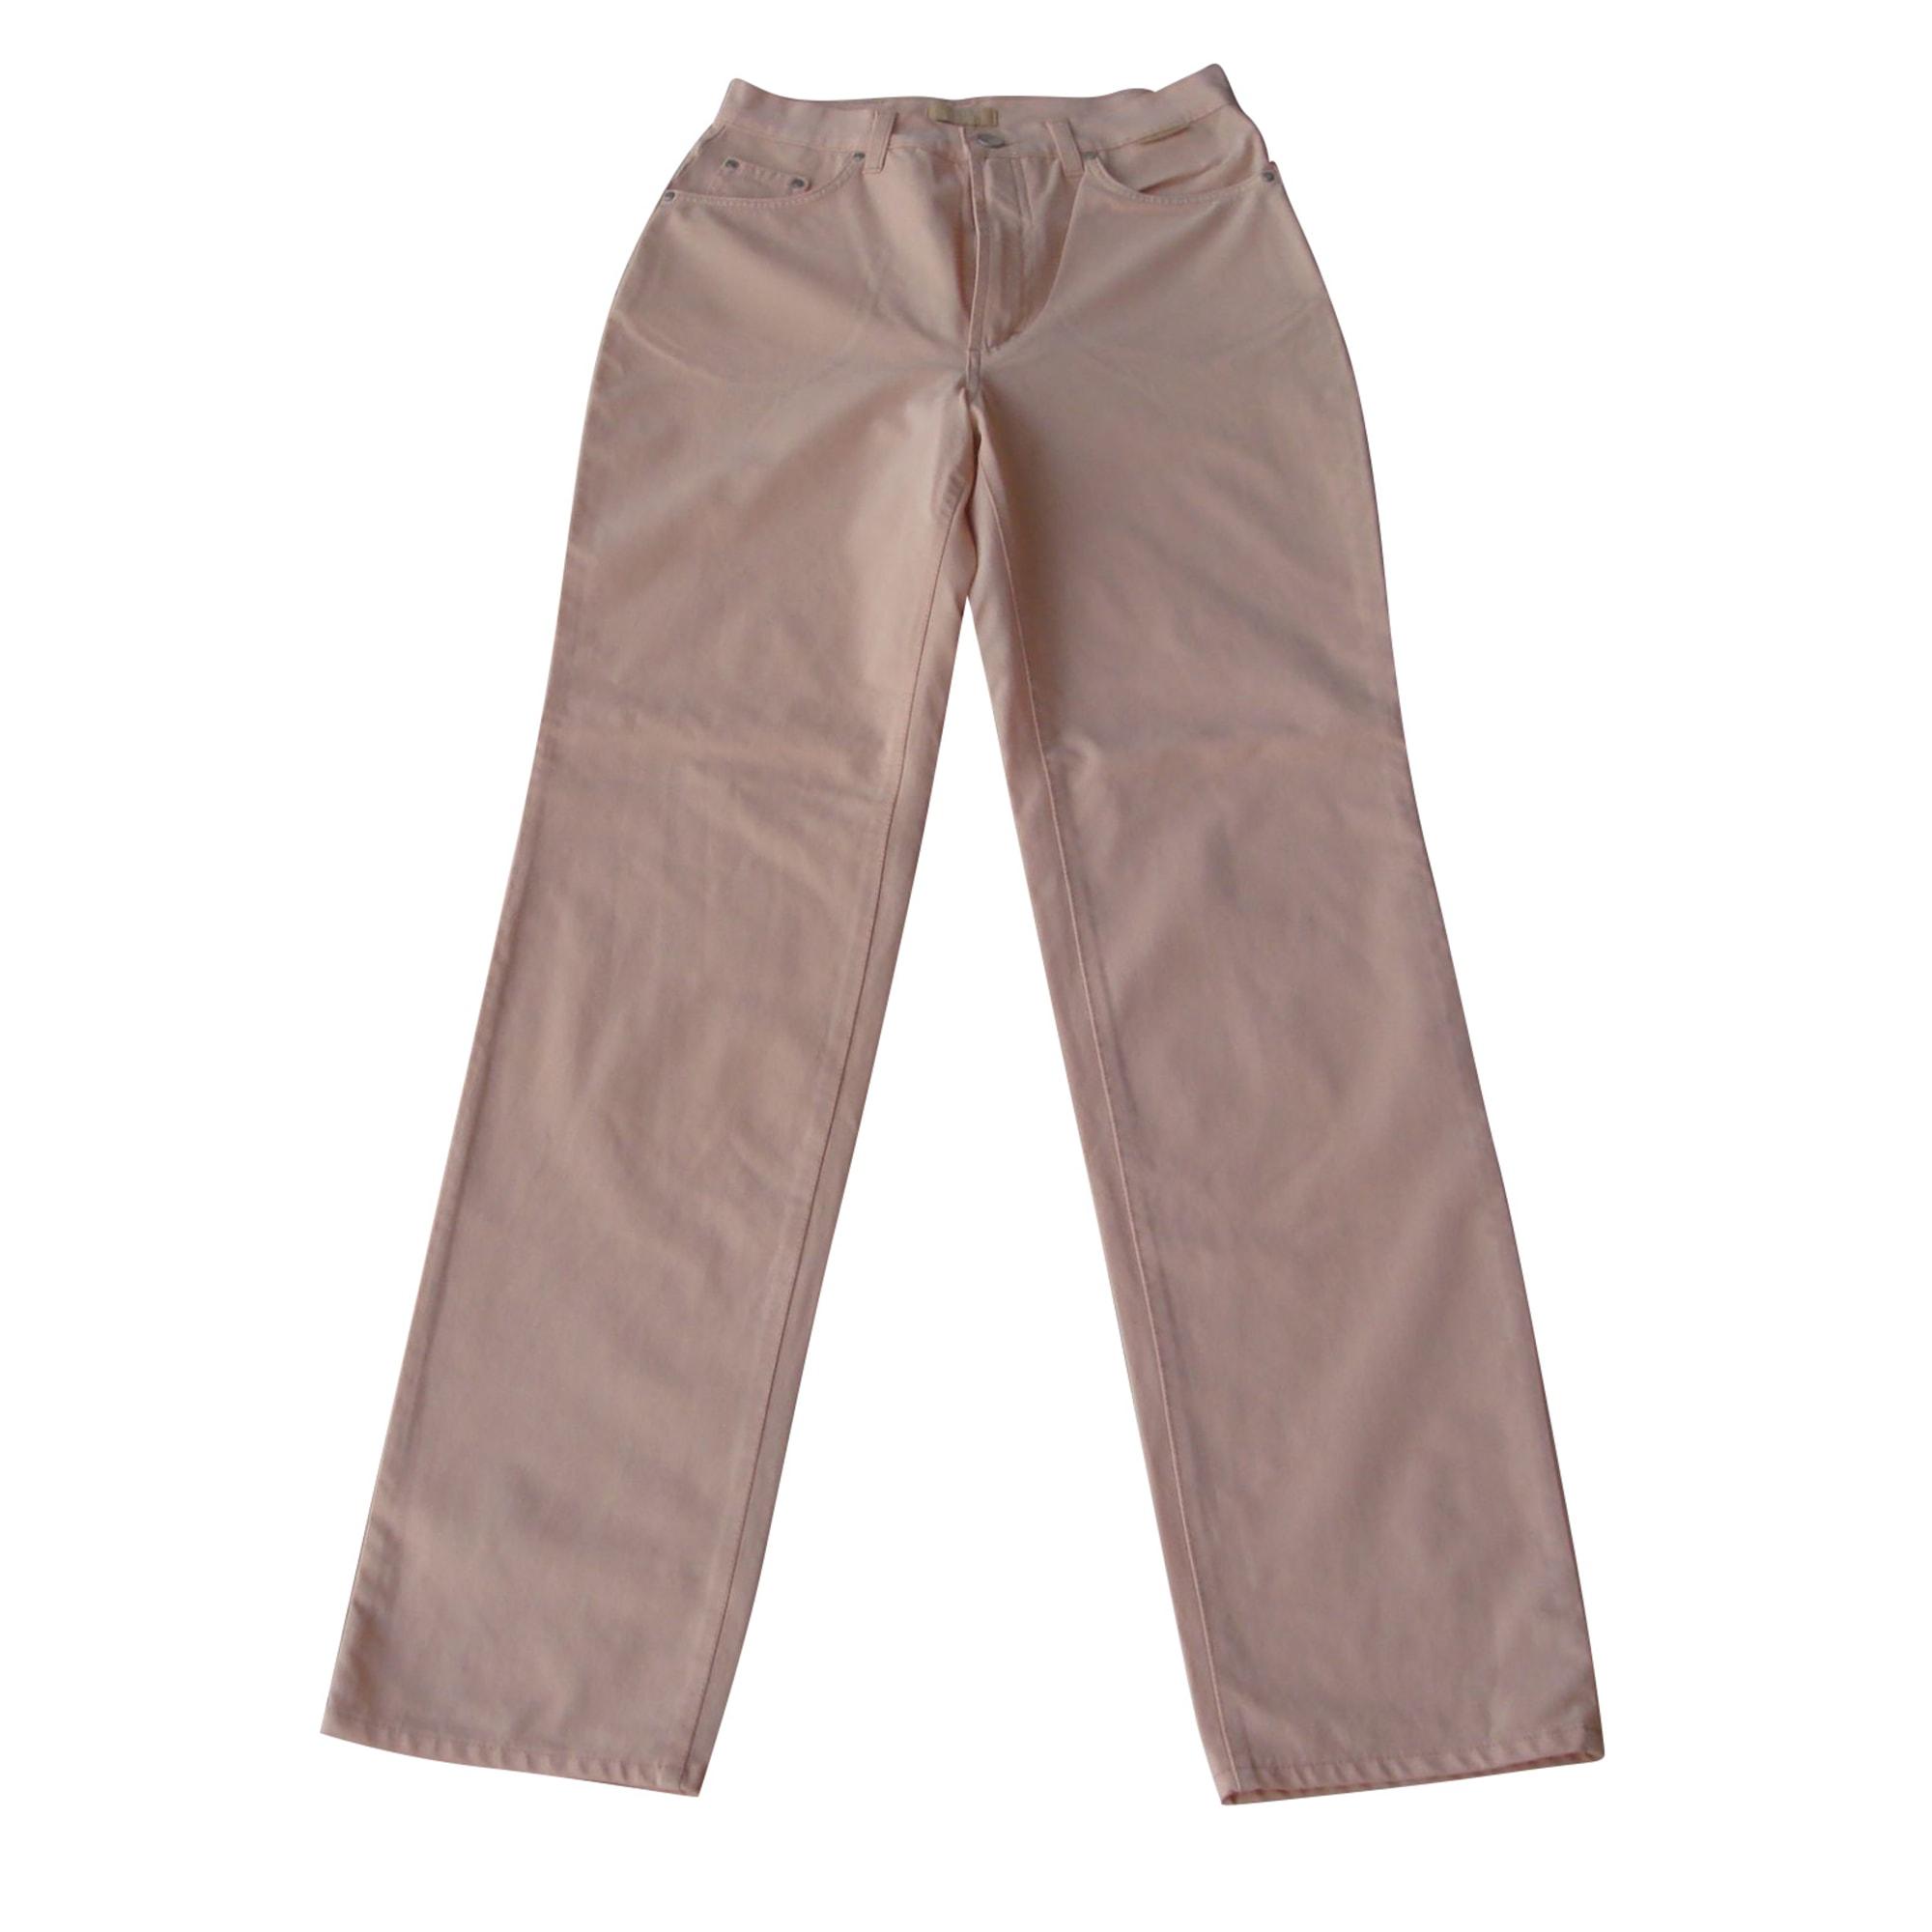 Pantalon droit GIANFRANCO FERRE NUDE